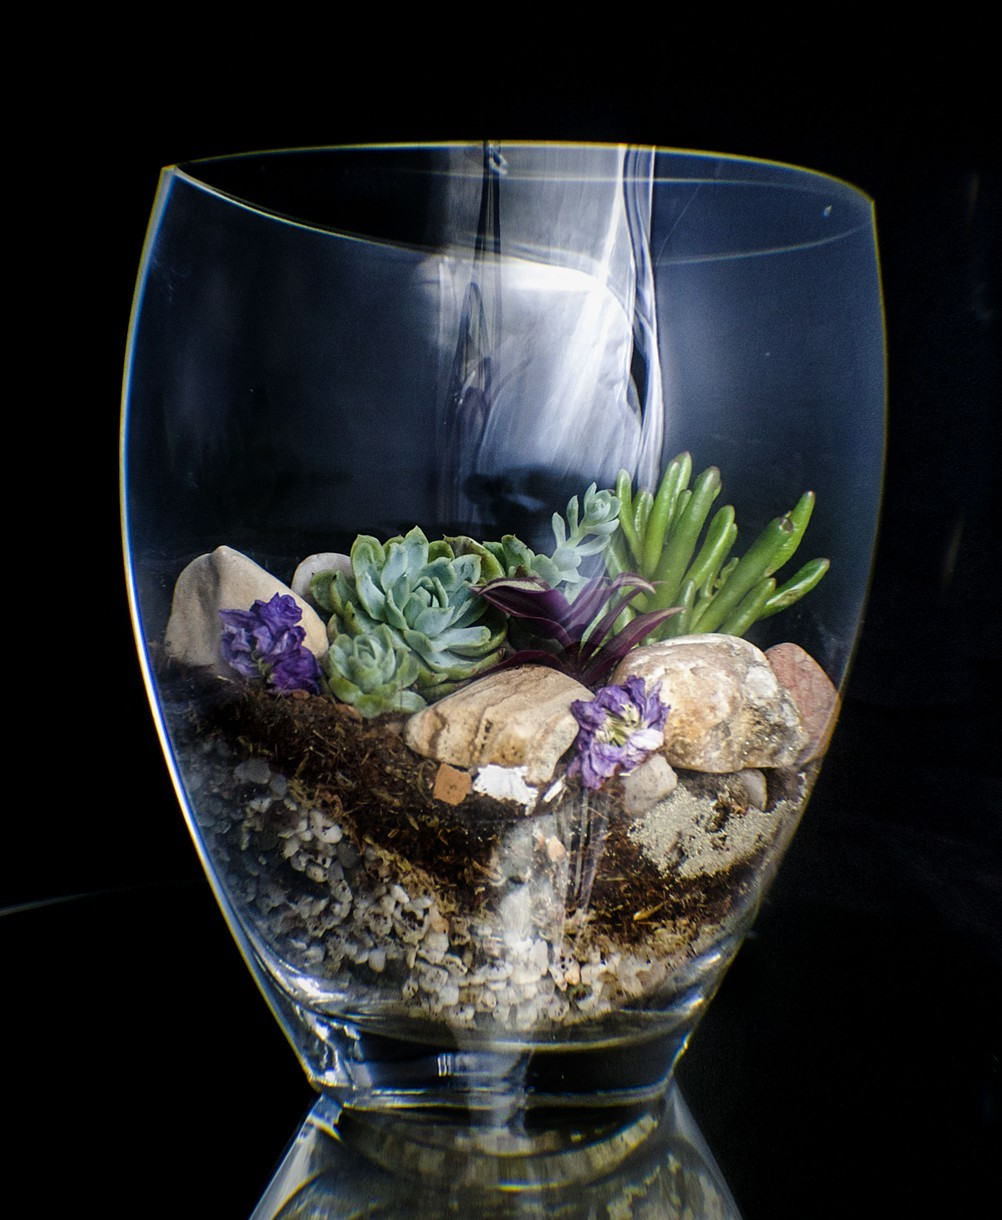 Medium-Succulent-Terrariumsucculents-Found-crystal-rock-dried-flowers-2015.jpg